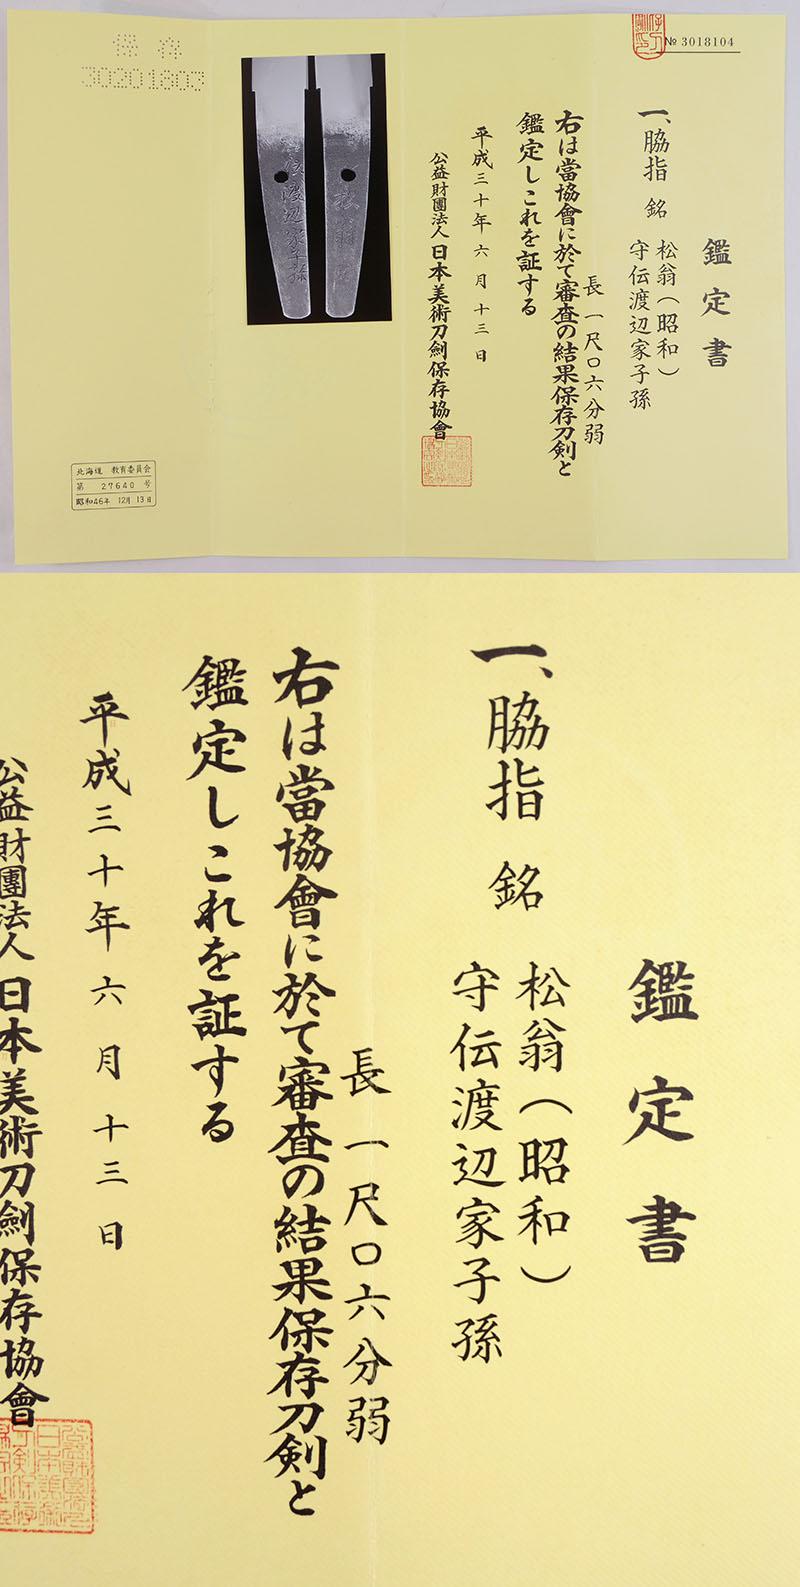 松翁(昭和) Picture of Certificate